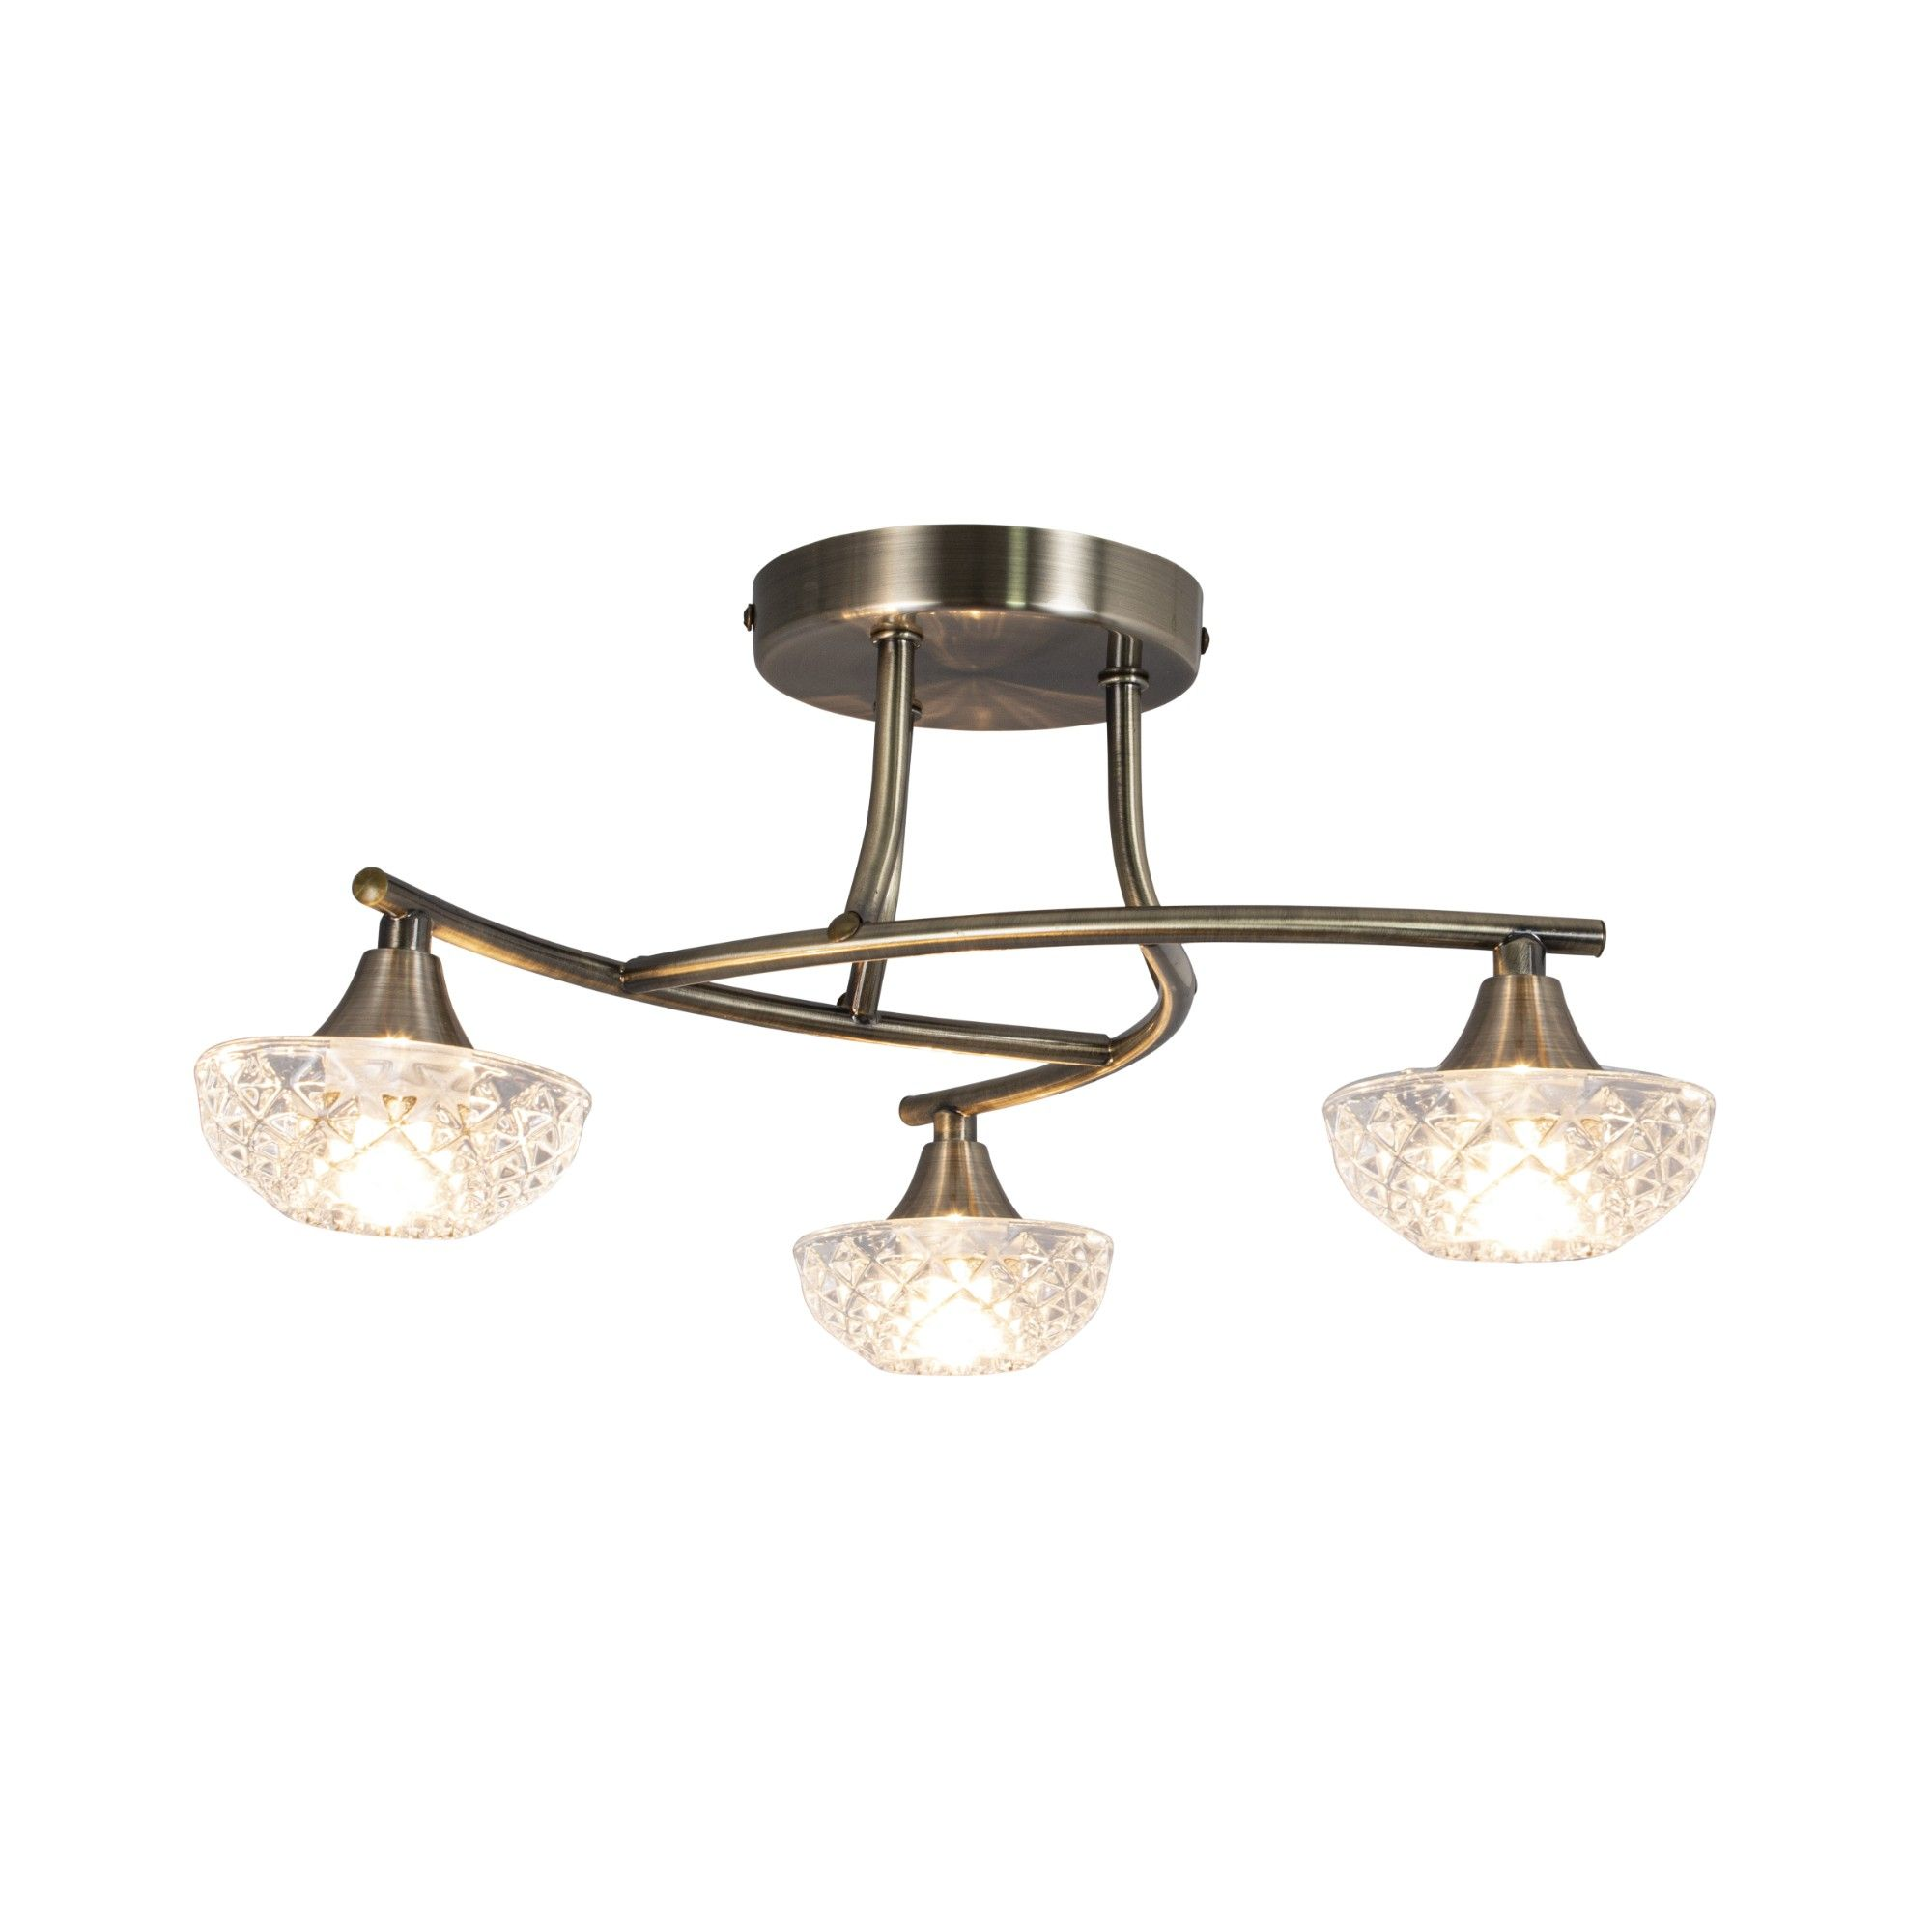 Paine Antique Brass 3 Light Semi Flush Ceiling Light